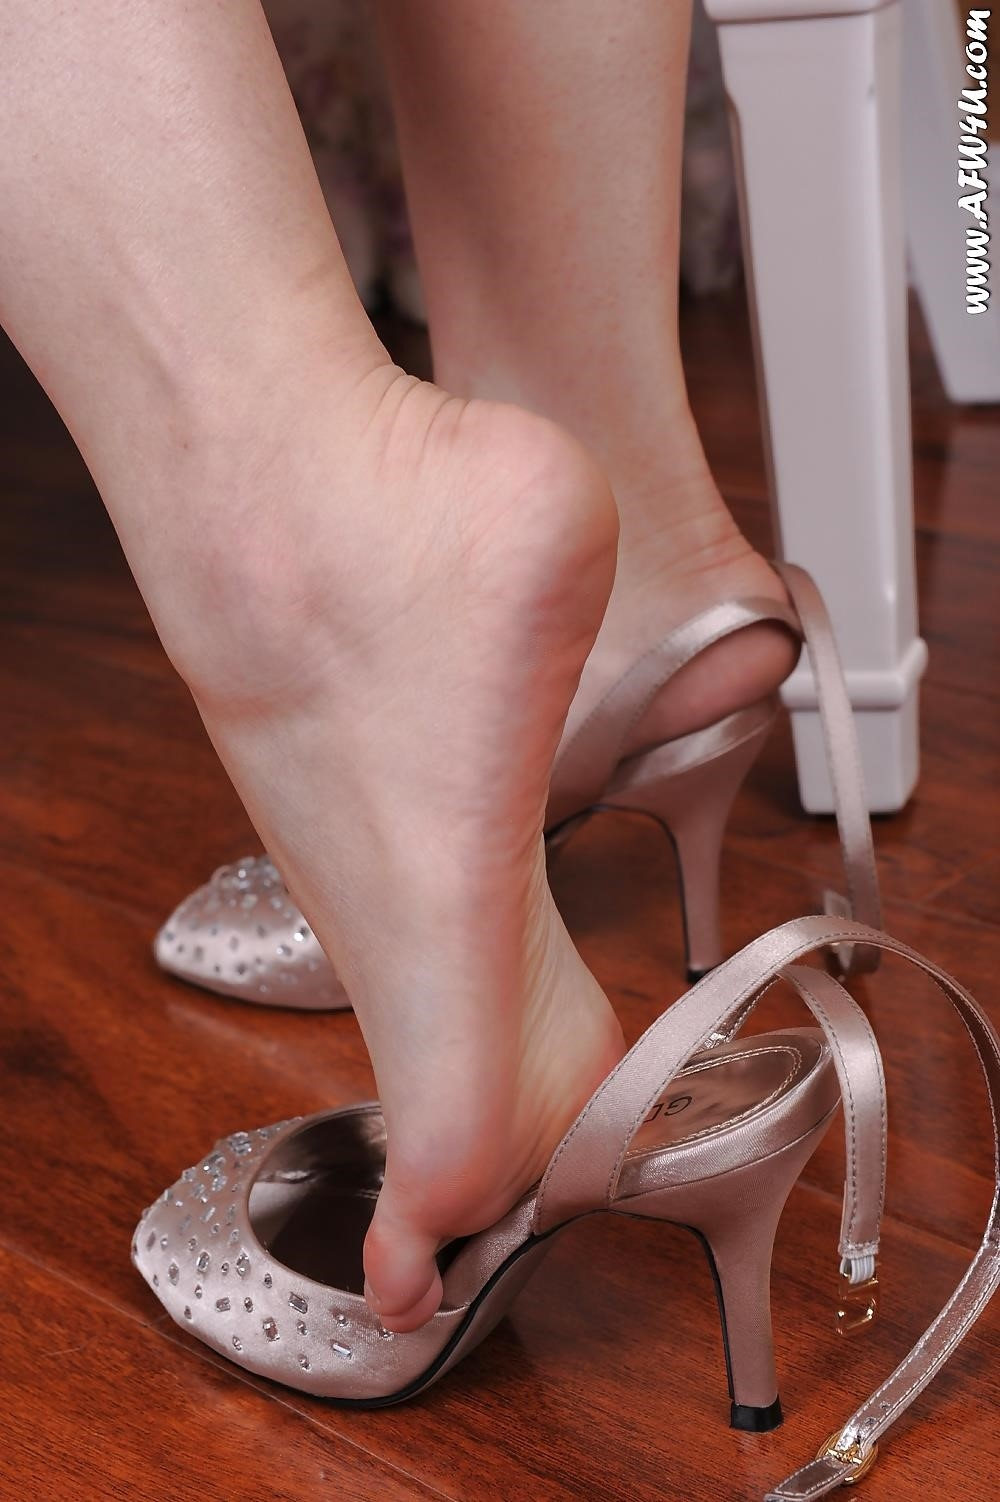 Asian feet footjob-4174